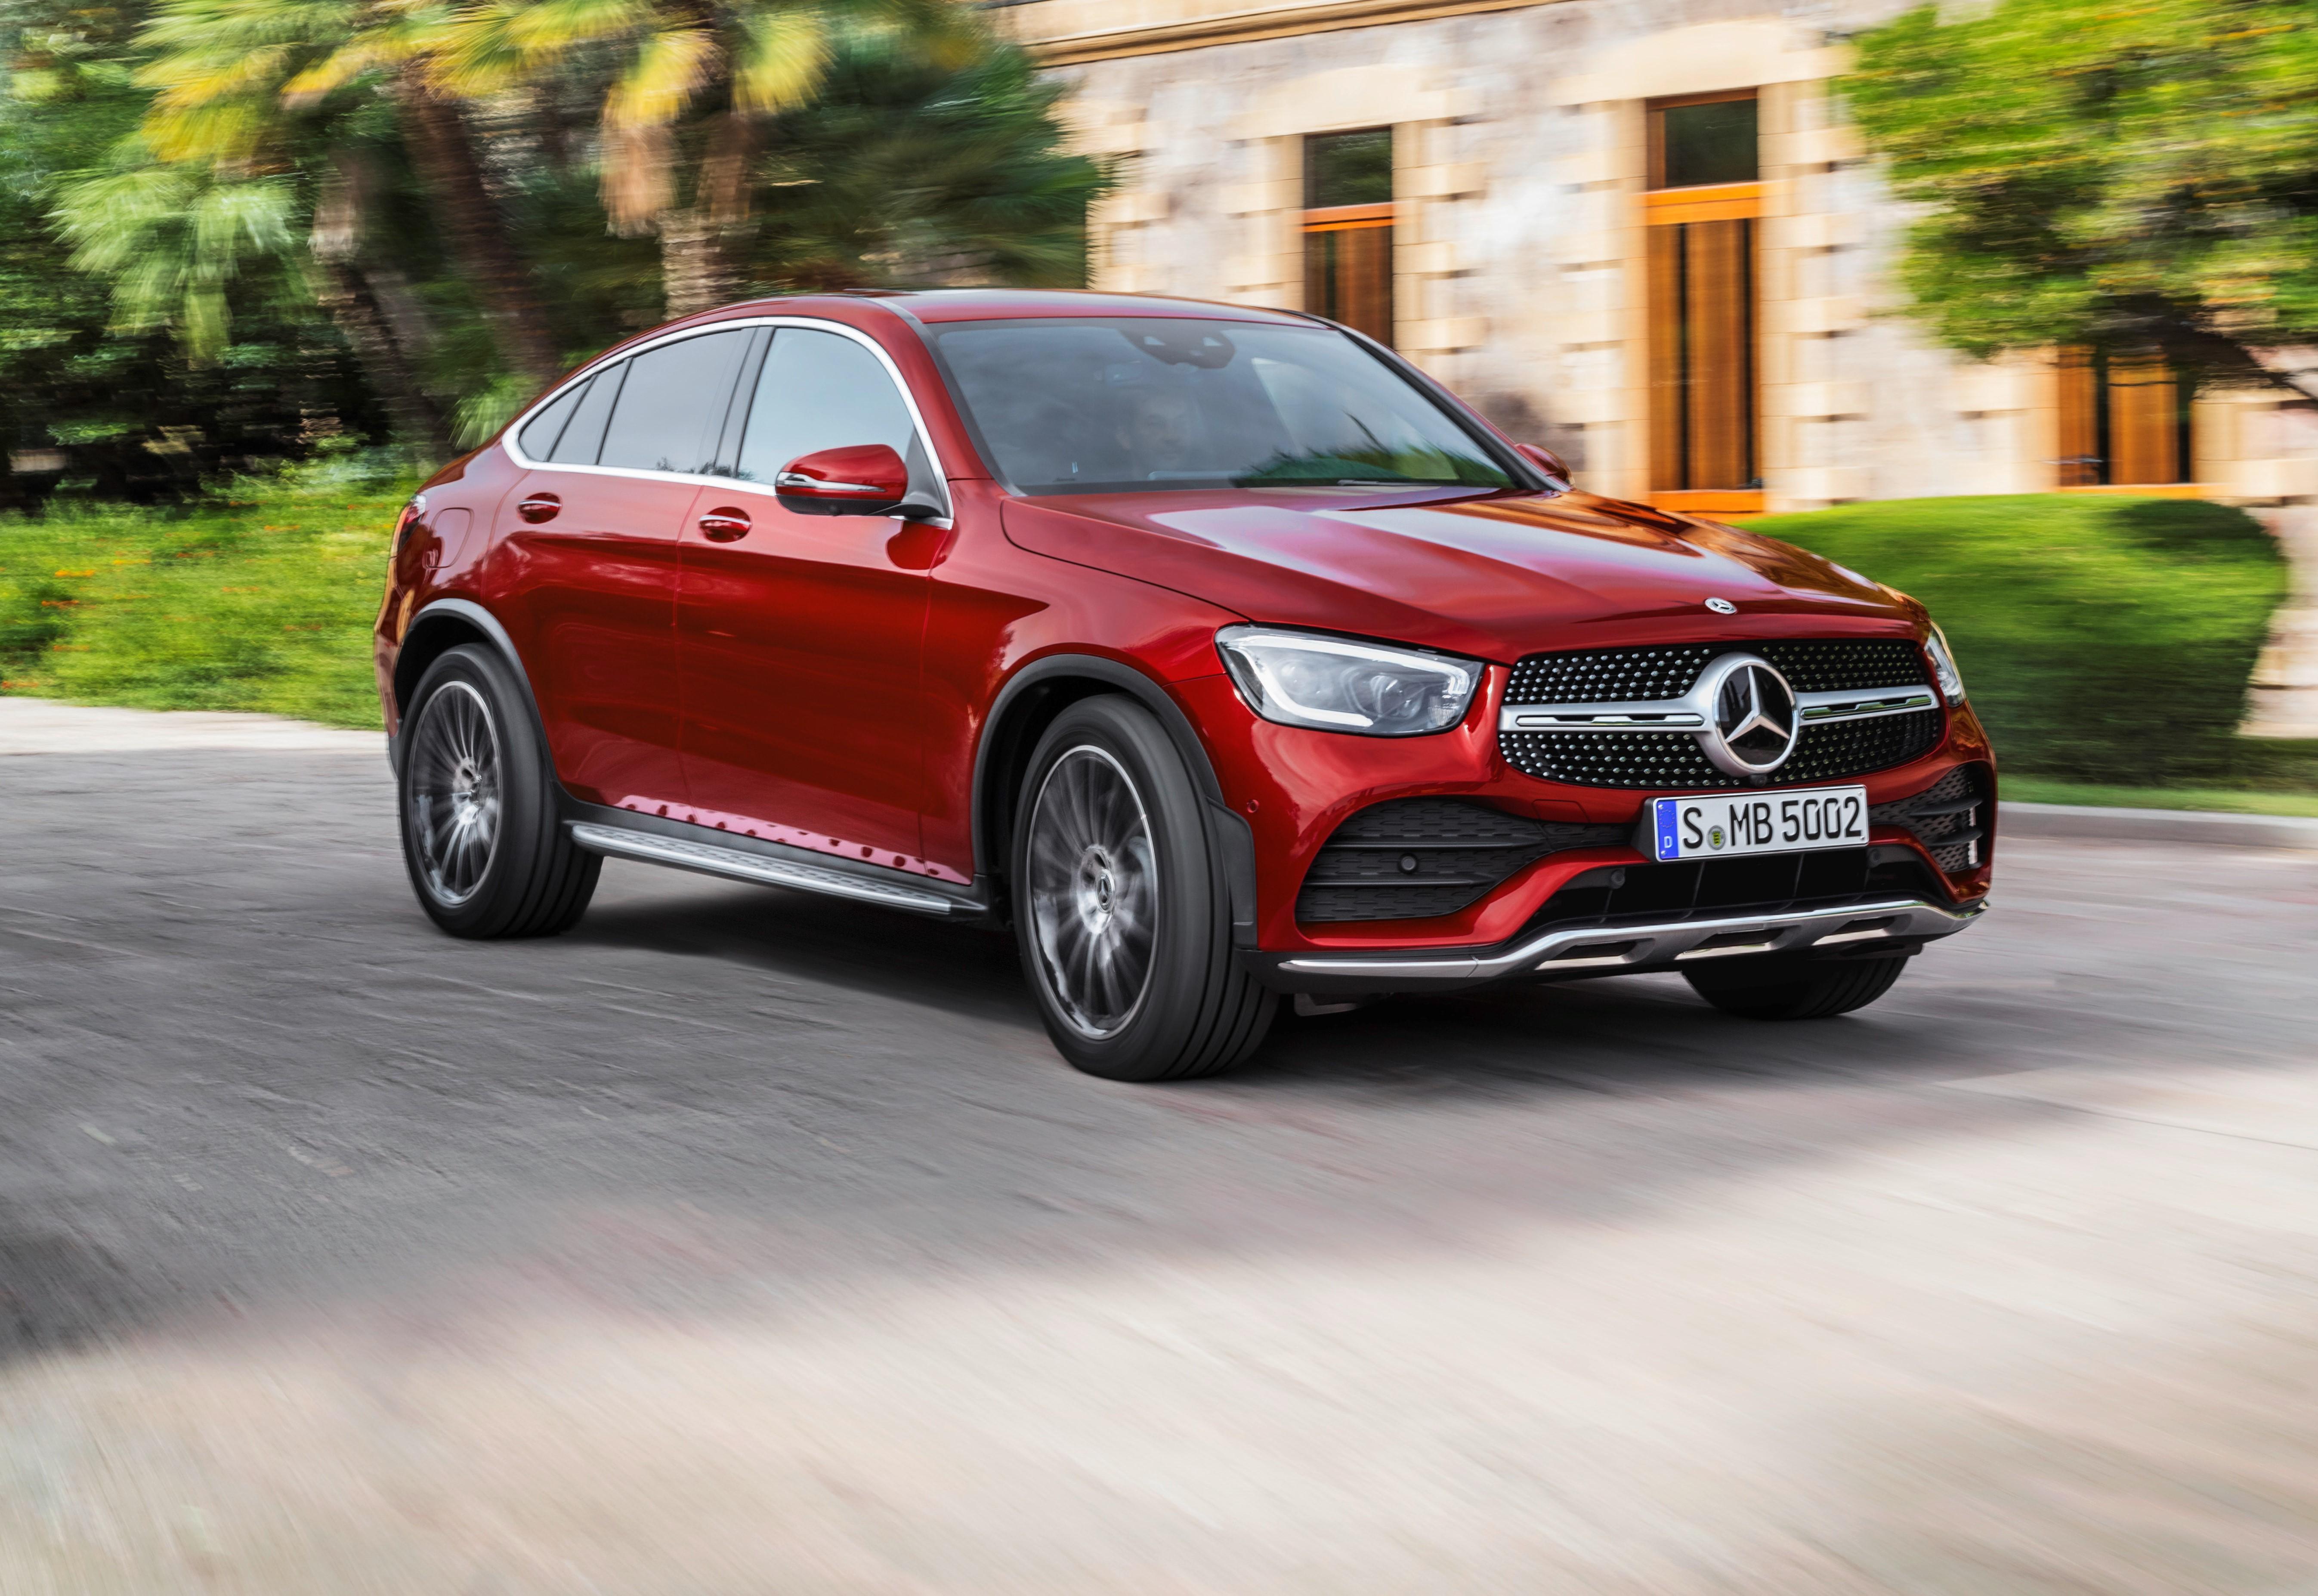 Mercedes Benz Glc Coupe Gets Midlife Facelift Wardsauto